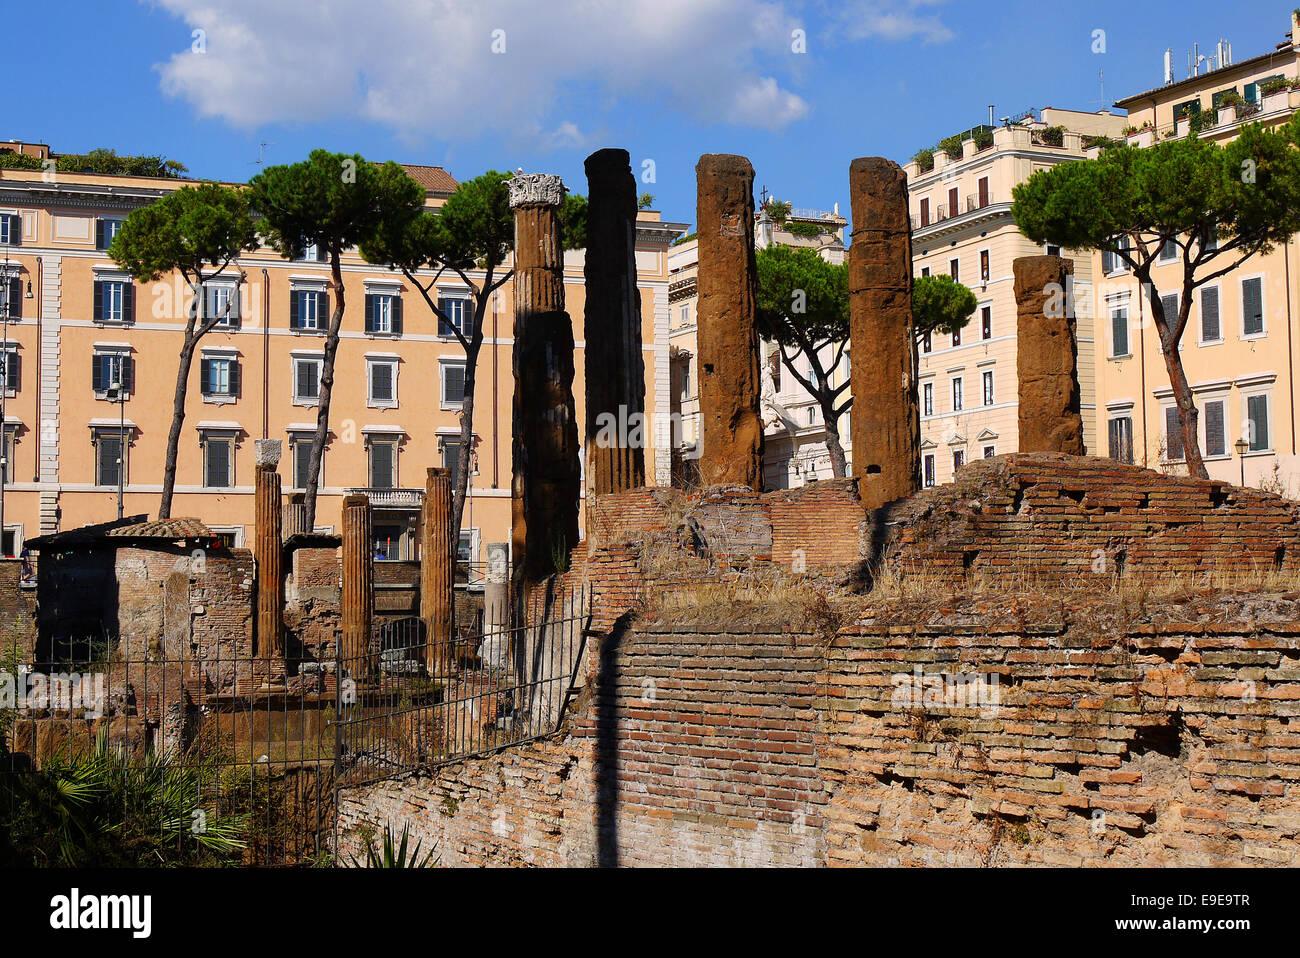 Largo di Torre Argentina di Roma, Italia. Immagini Stock